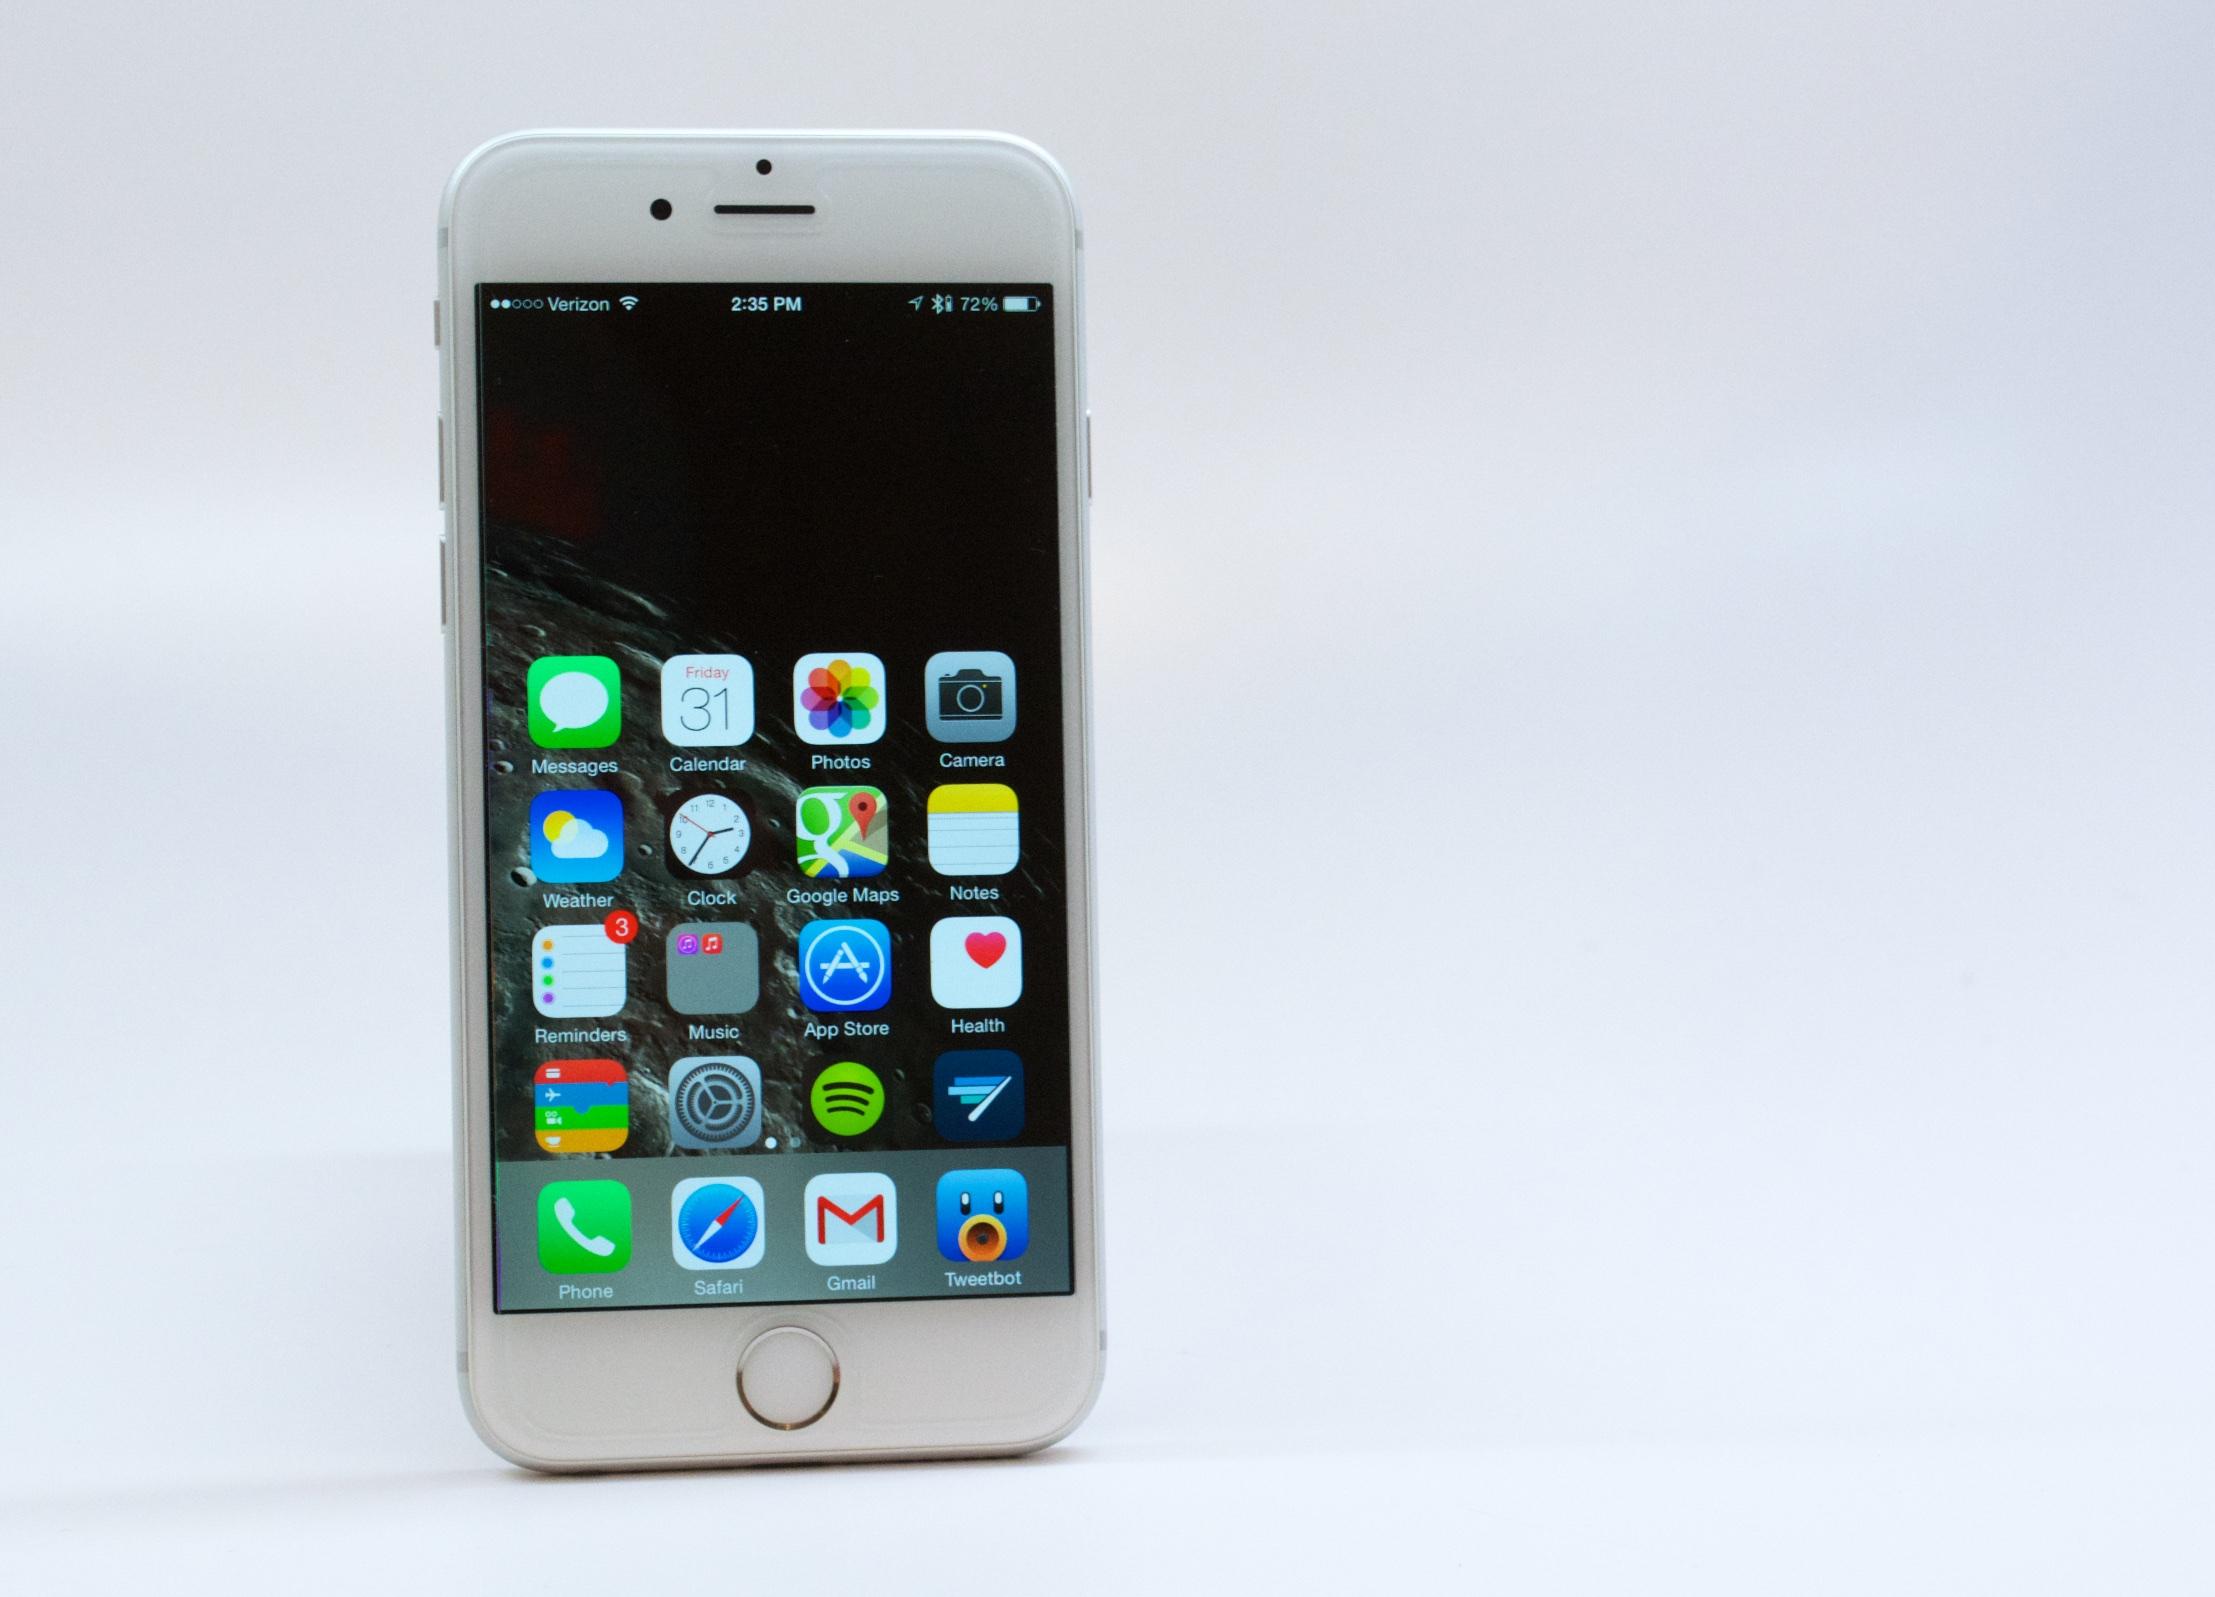 Granskning av iPhone 6 - 10